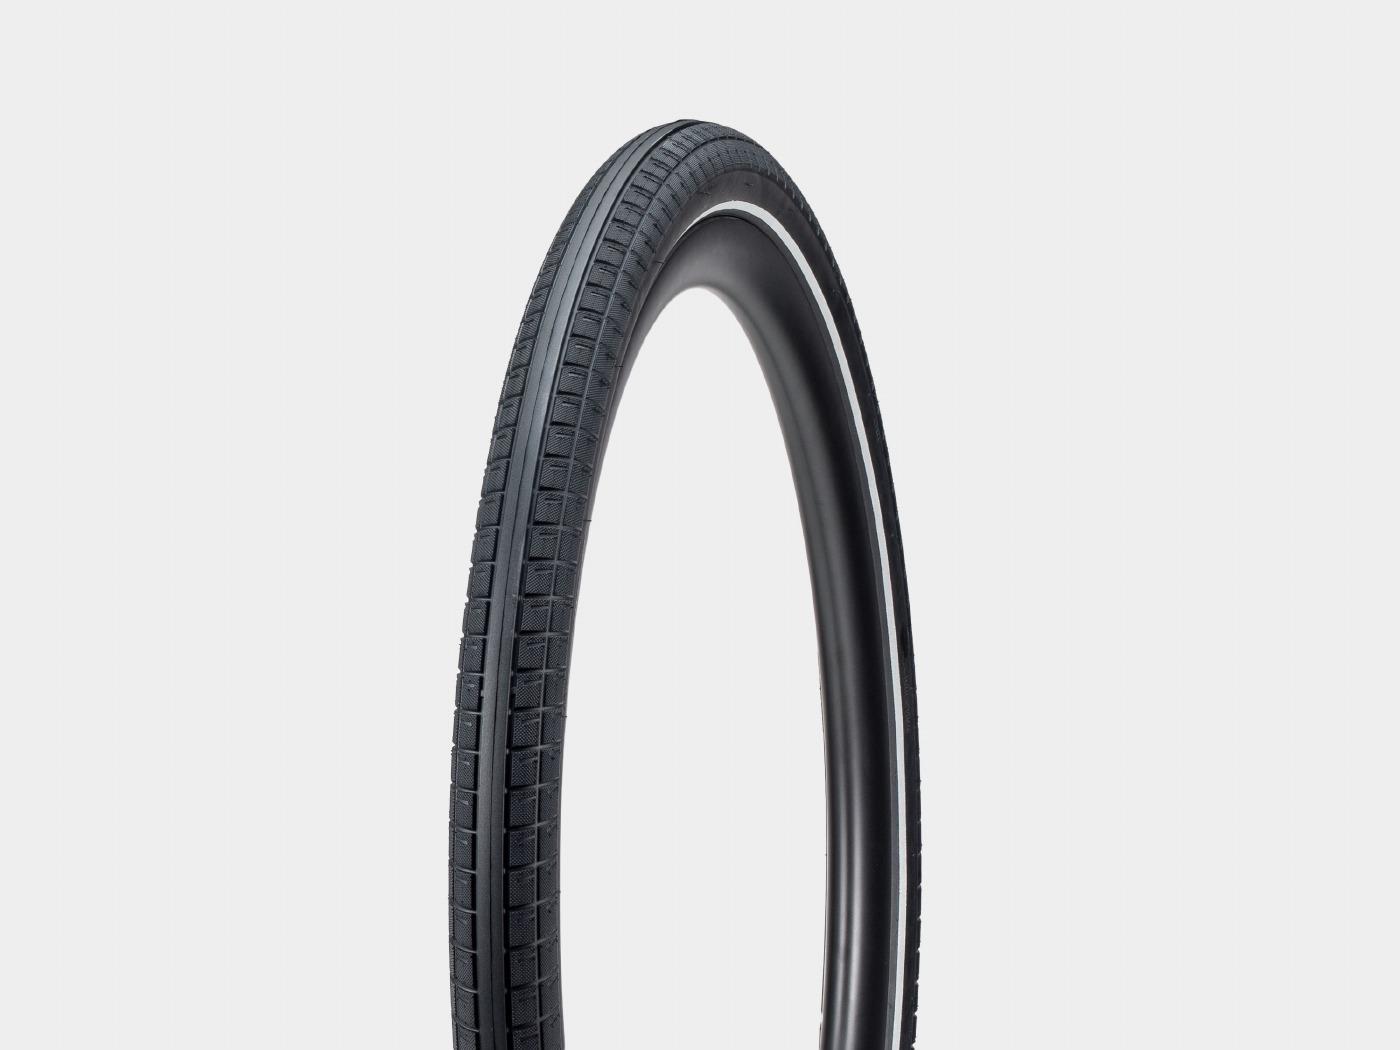 + 2 tuyaux assortis 26-622 + 3 d/émonte-pneus maxxi4you K-196 Lot de 2 pneus de v/élo de course Bleu 700 x 26C SV